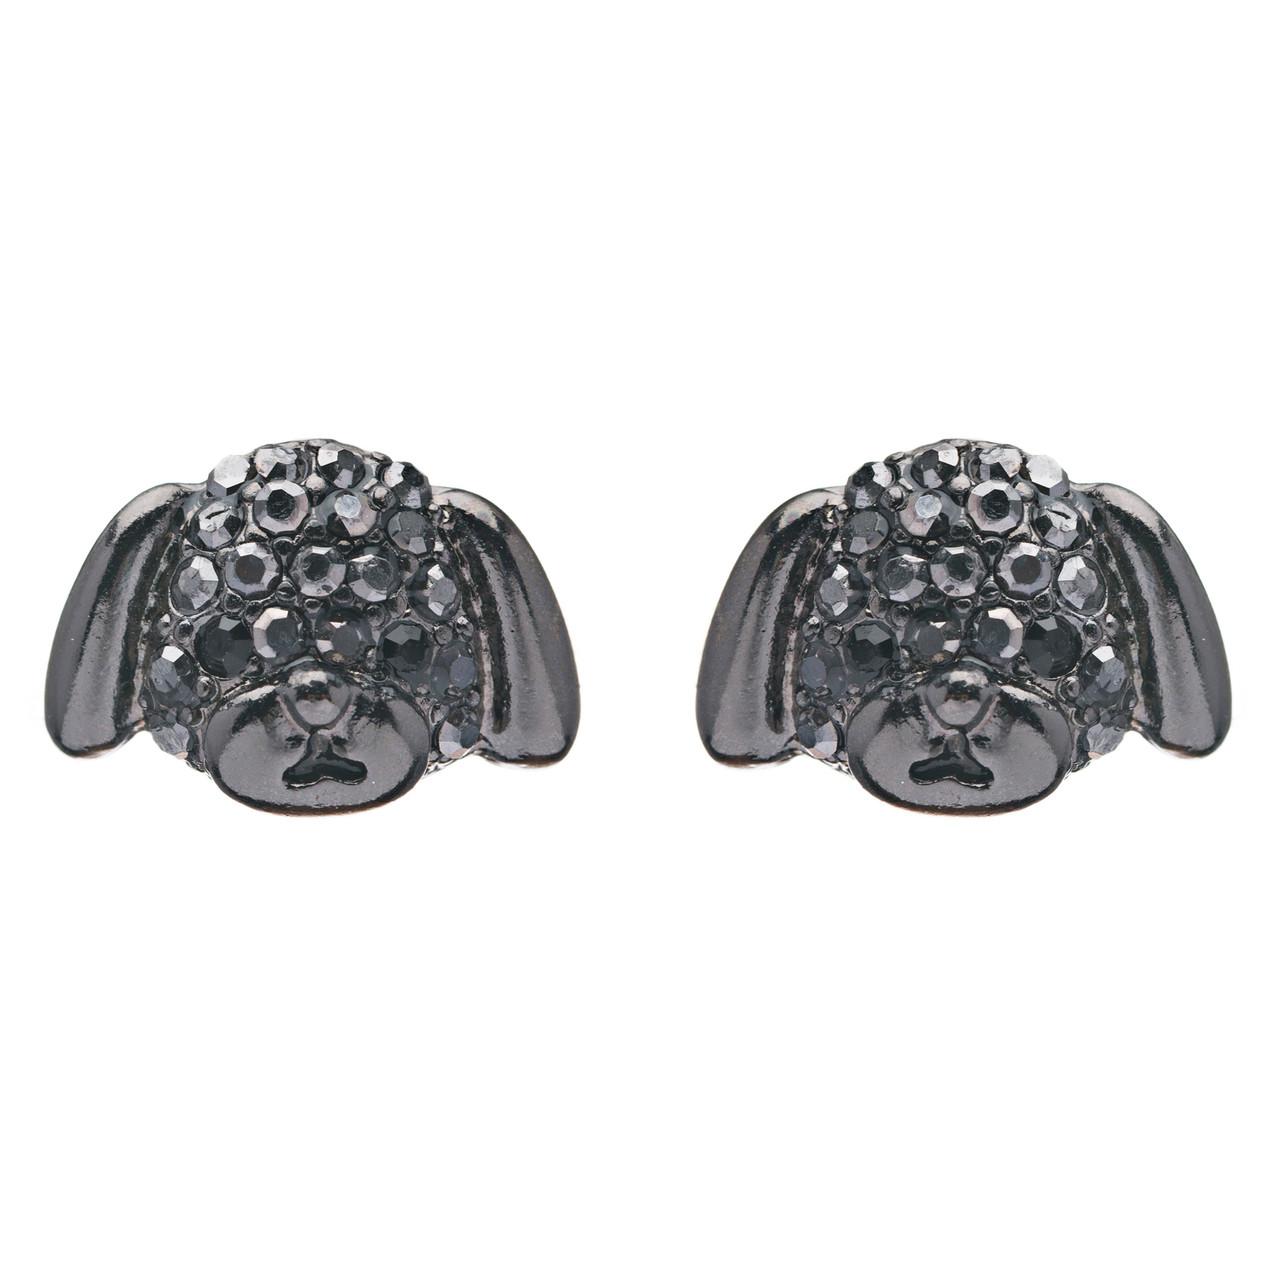 d92ffed41 Accessoriesforever | Puppy Dog Crystal Rhinestone Fashion Small Stud  Earrings Hematite Black